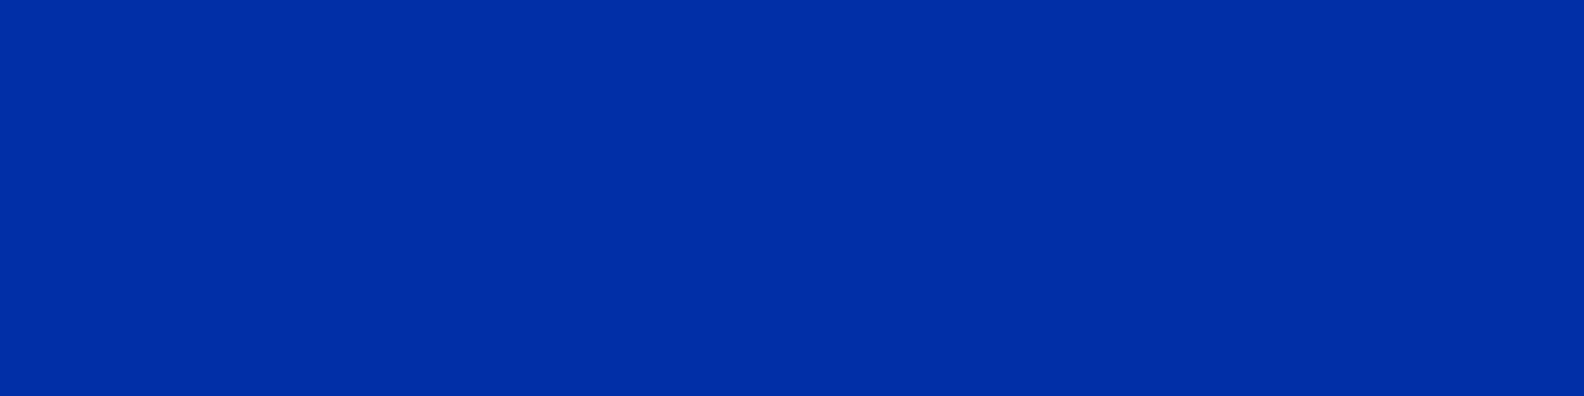 1584x396 International Klein Blue Solid Color Background